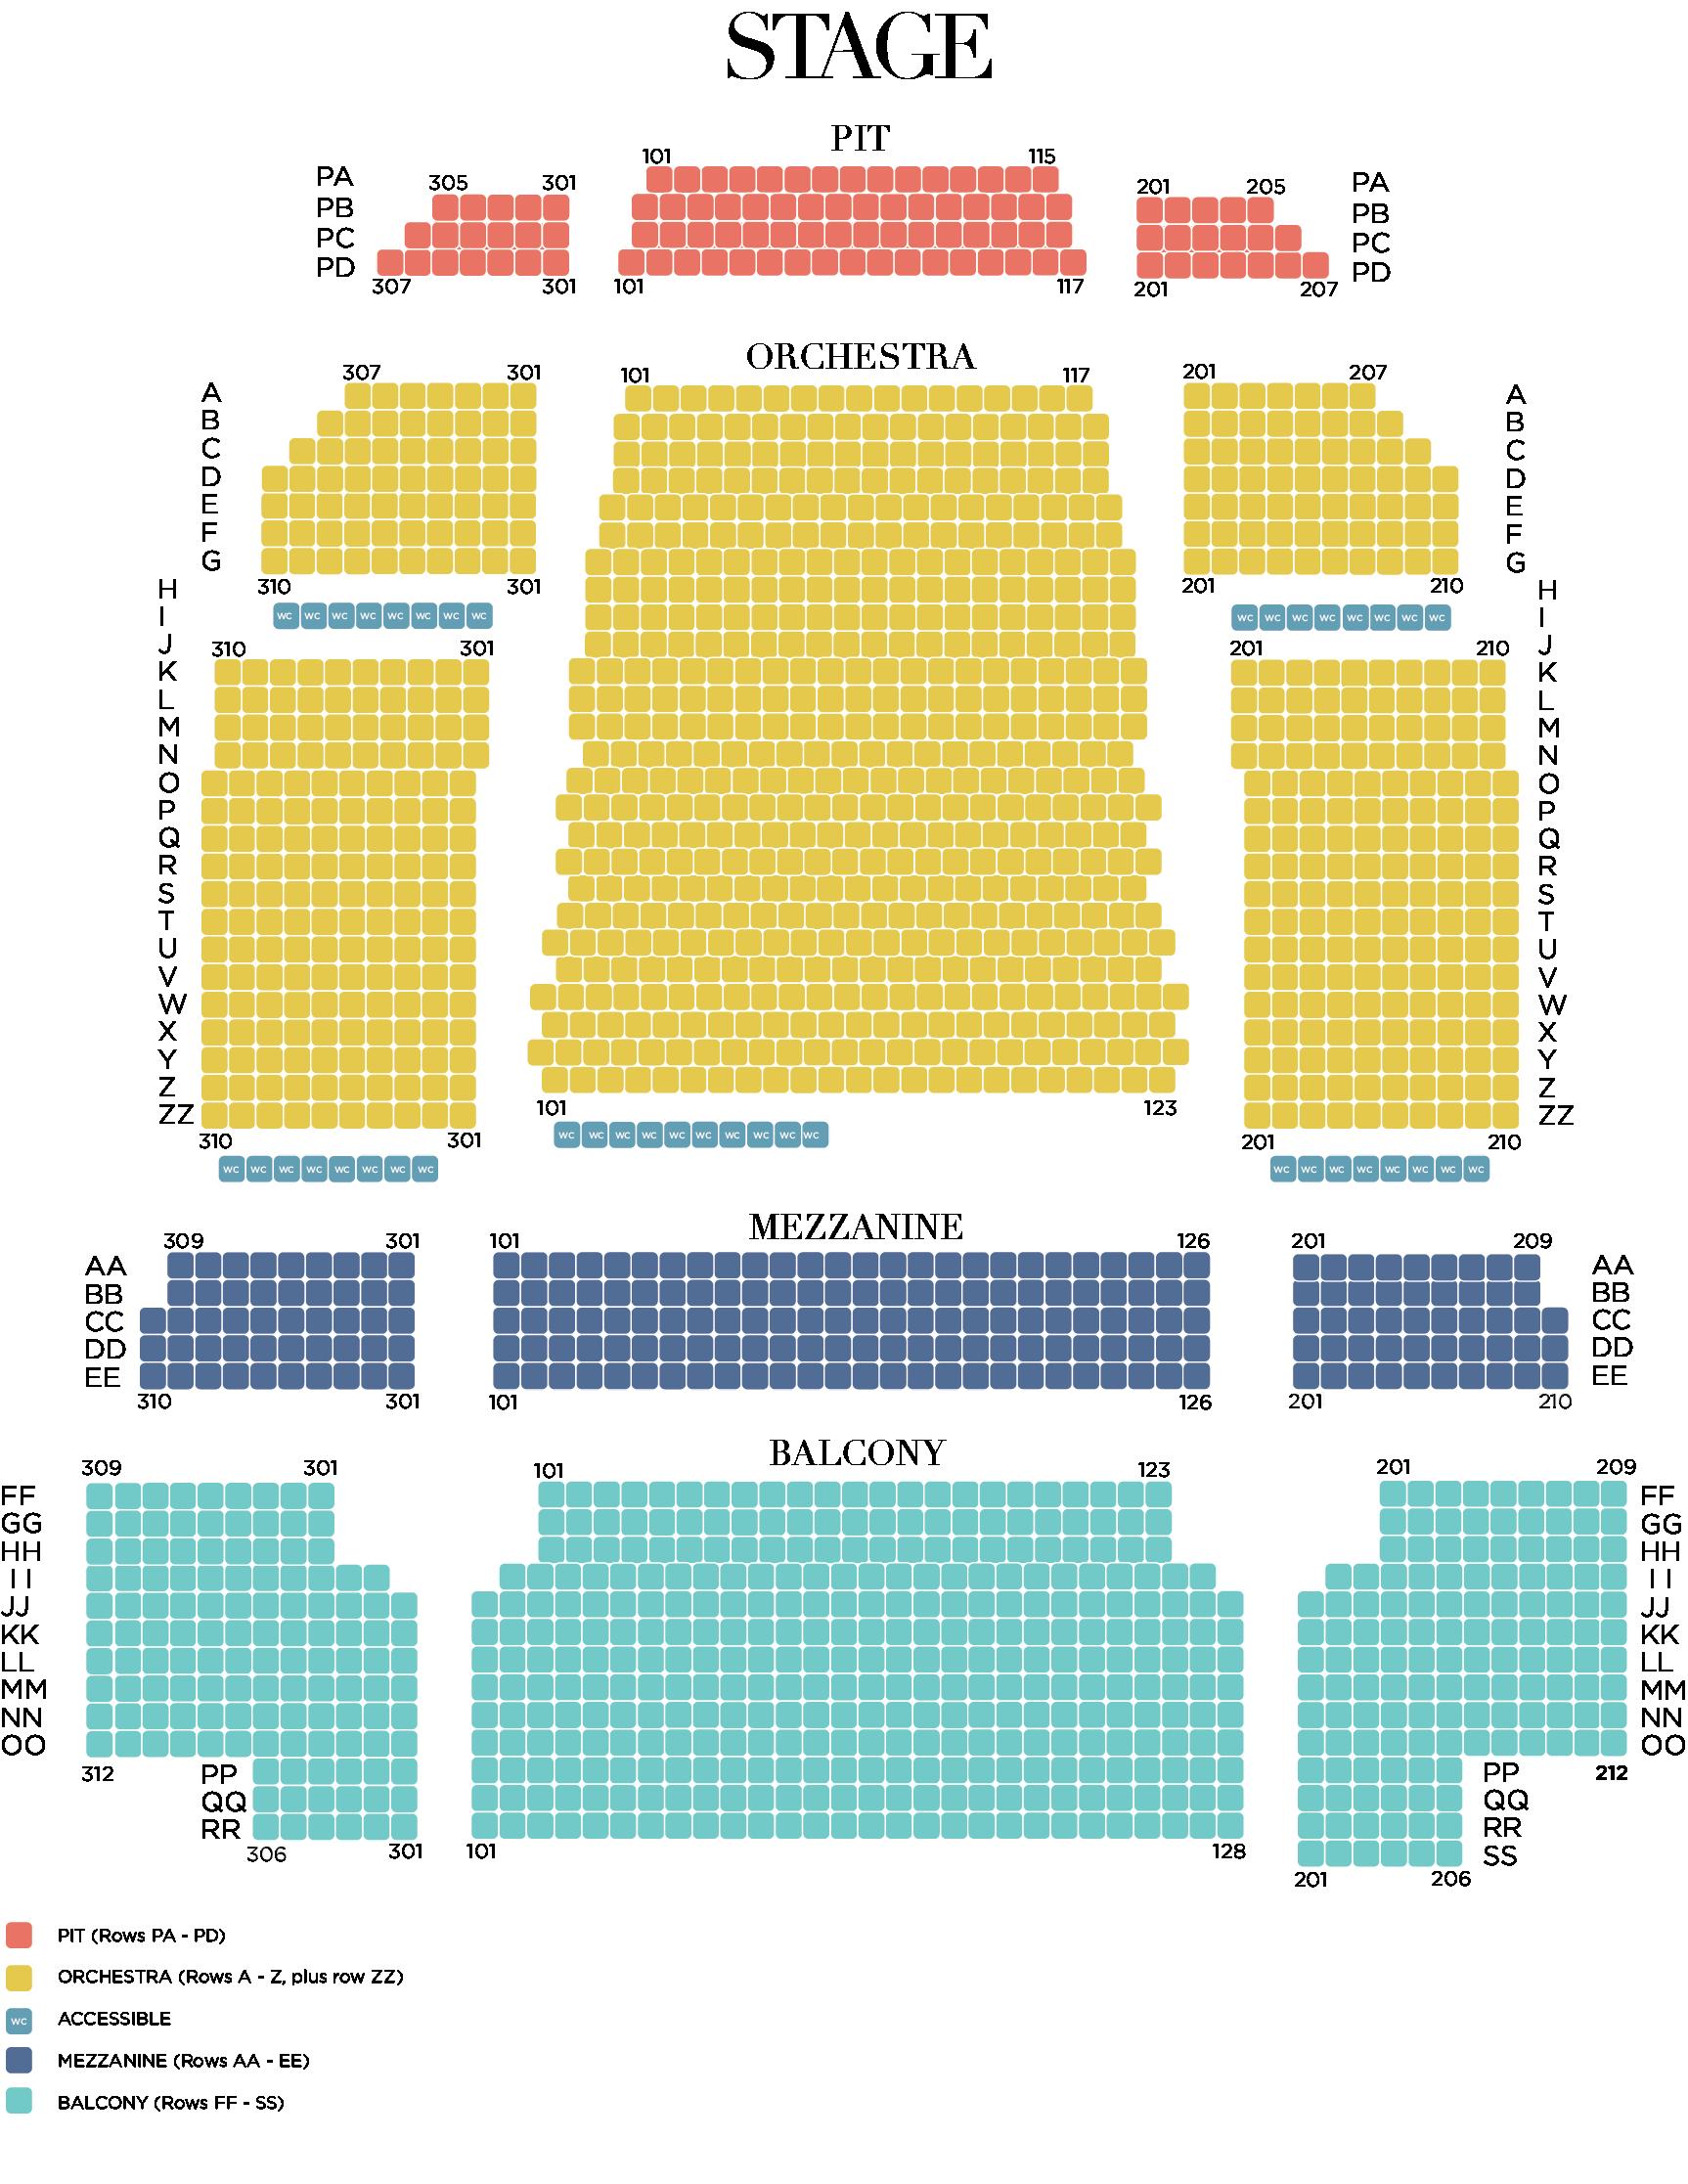 19-20 Seating Chart Levels